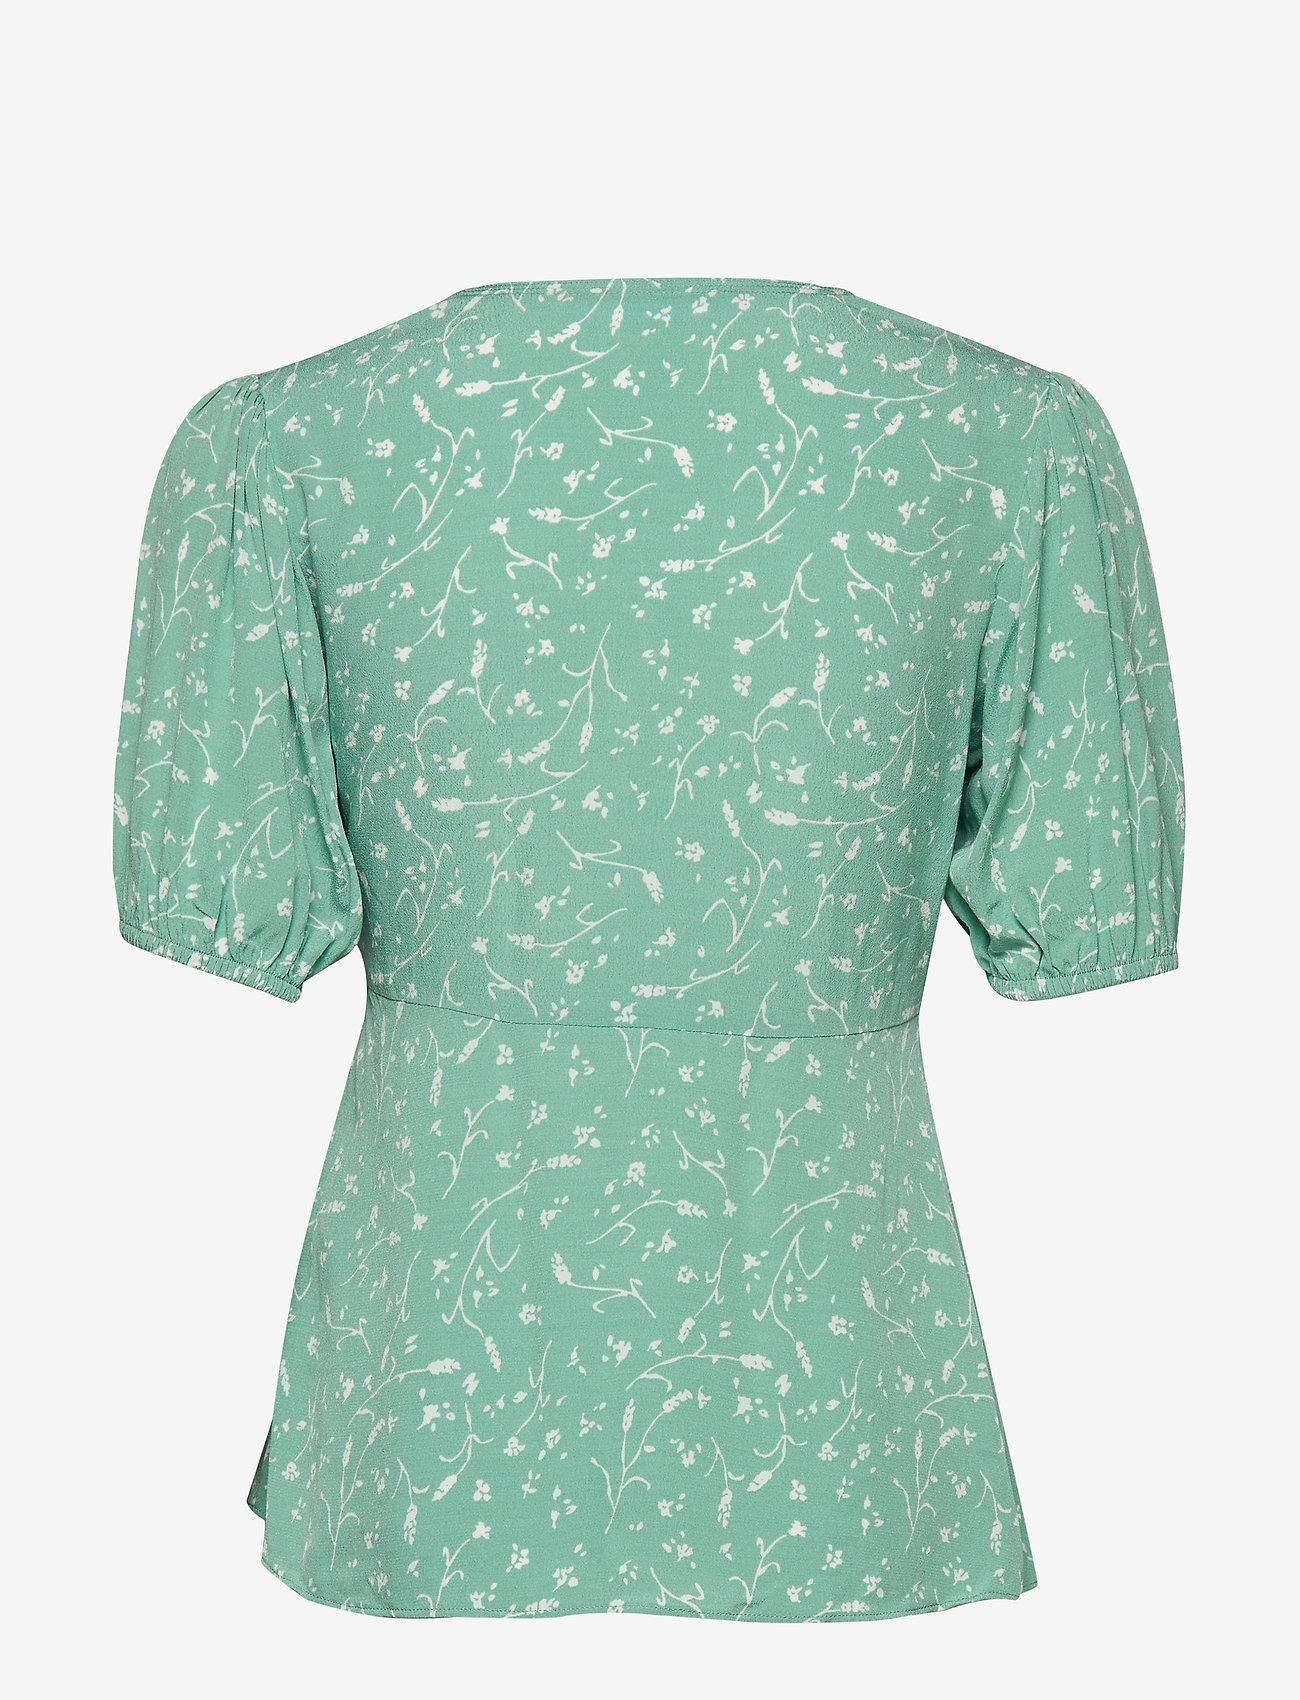 Samsøe Samsøe - Petunia ss blouse aop 10056 - blouses met korte mouwen - feuilles menthe - 1